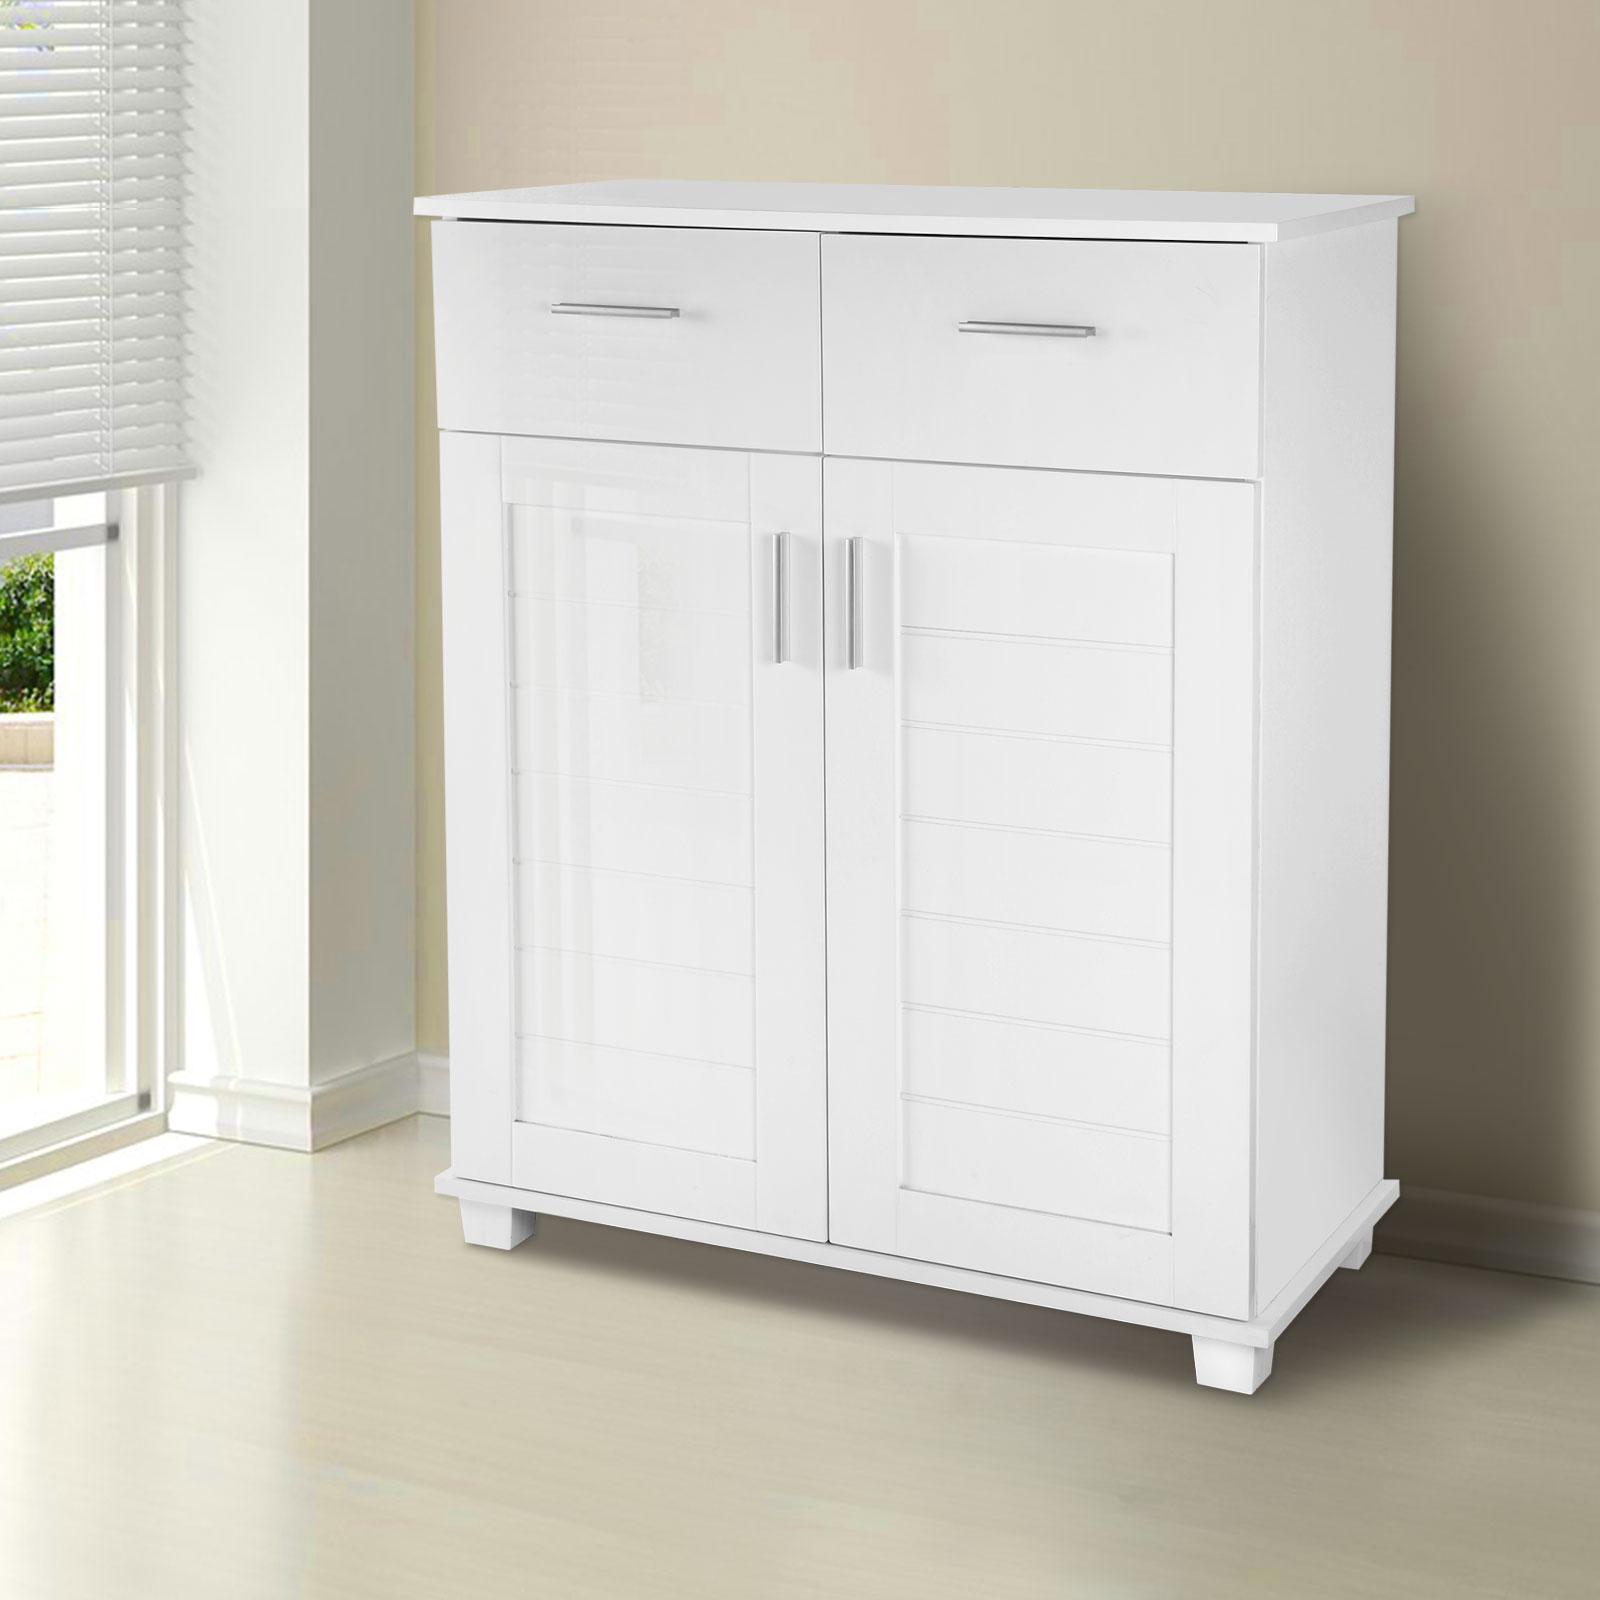 High Gloss Shoe Storage Cabinet Organizer Closet 4 Shelf